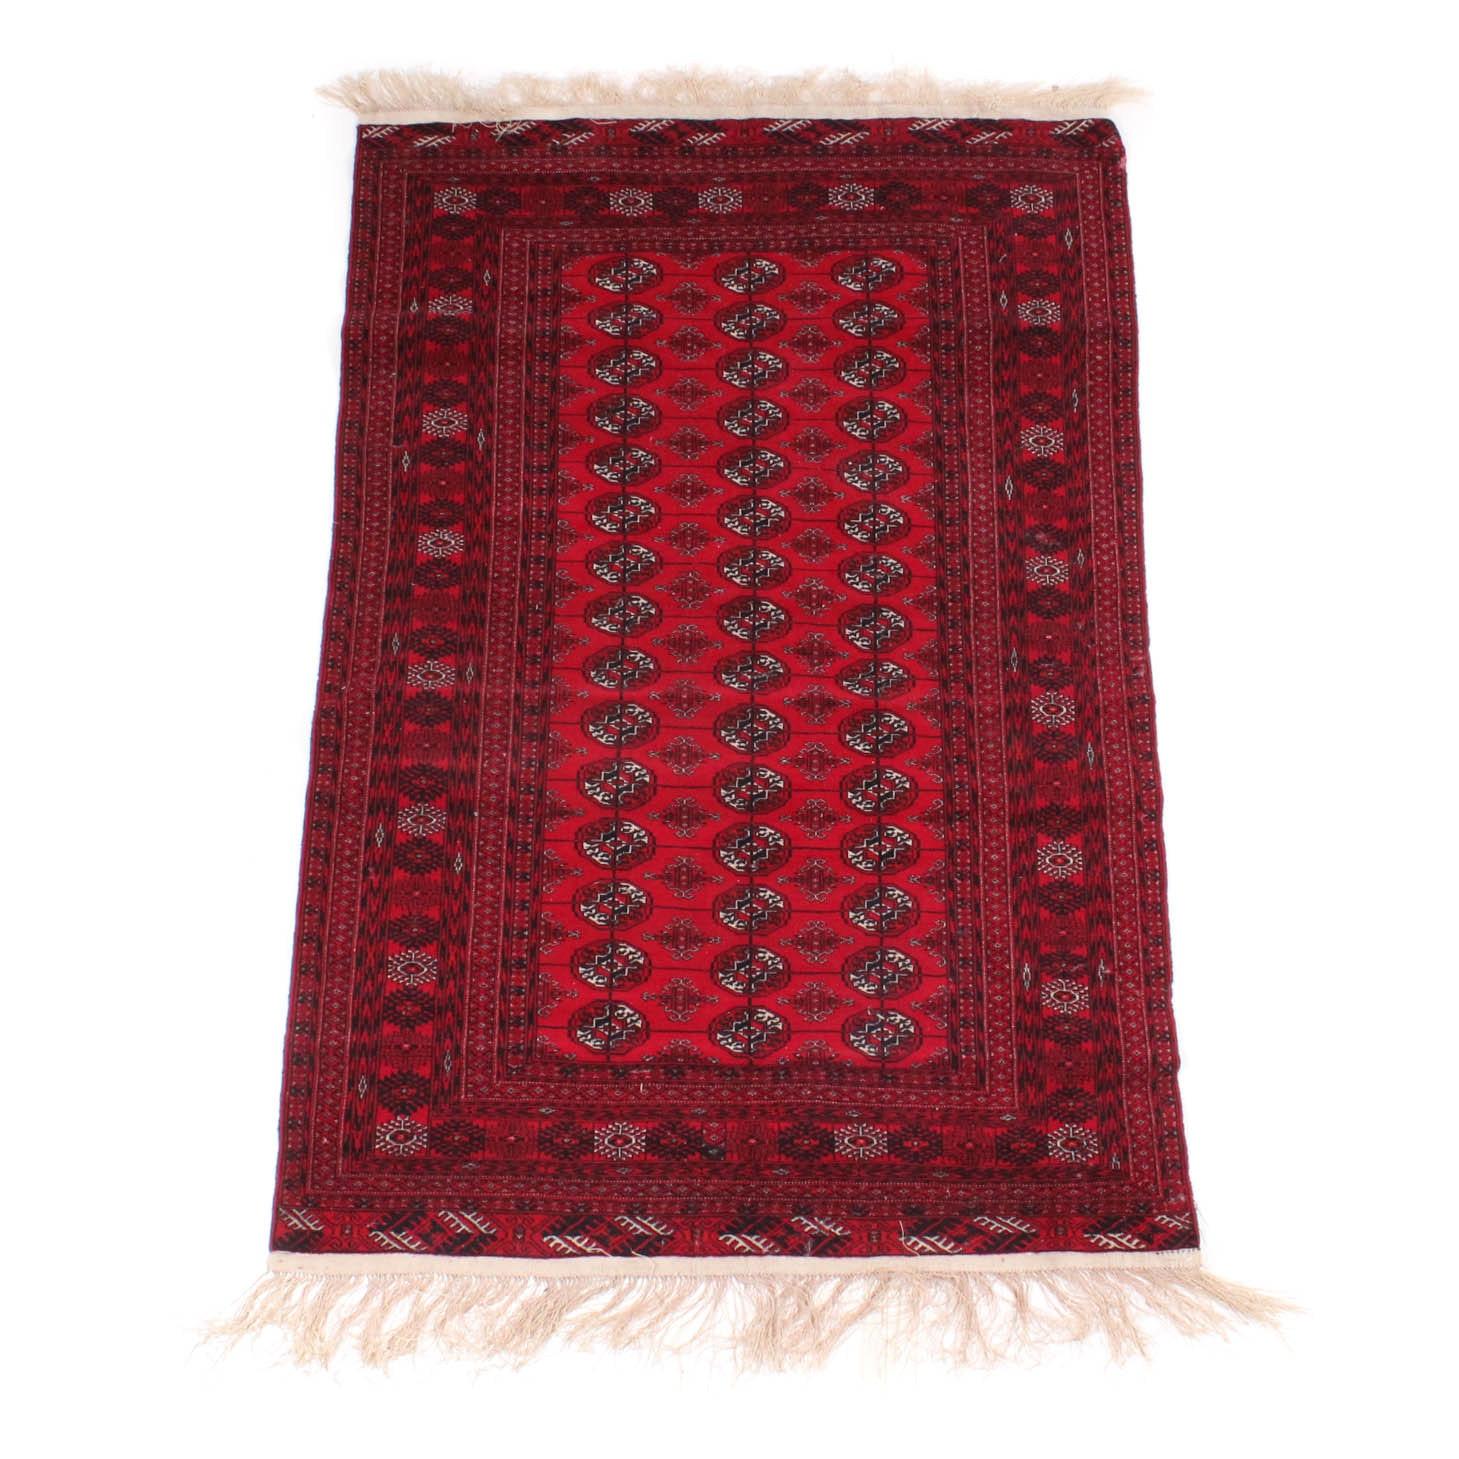 Antique Hand Knotted Afghani Turkmen Rug